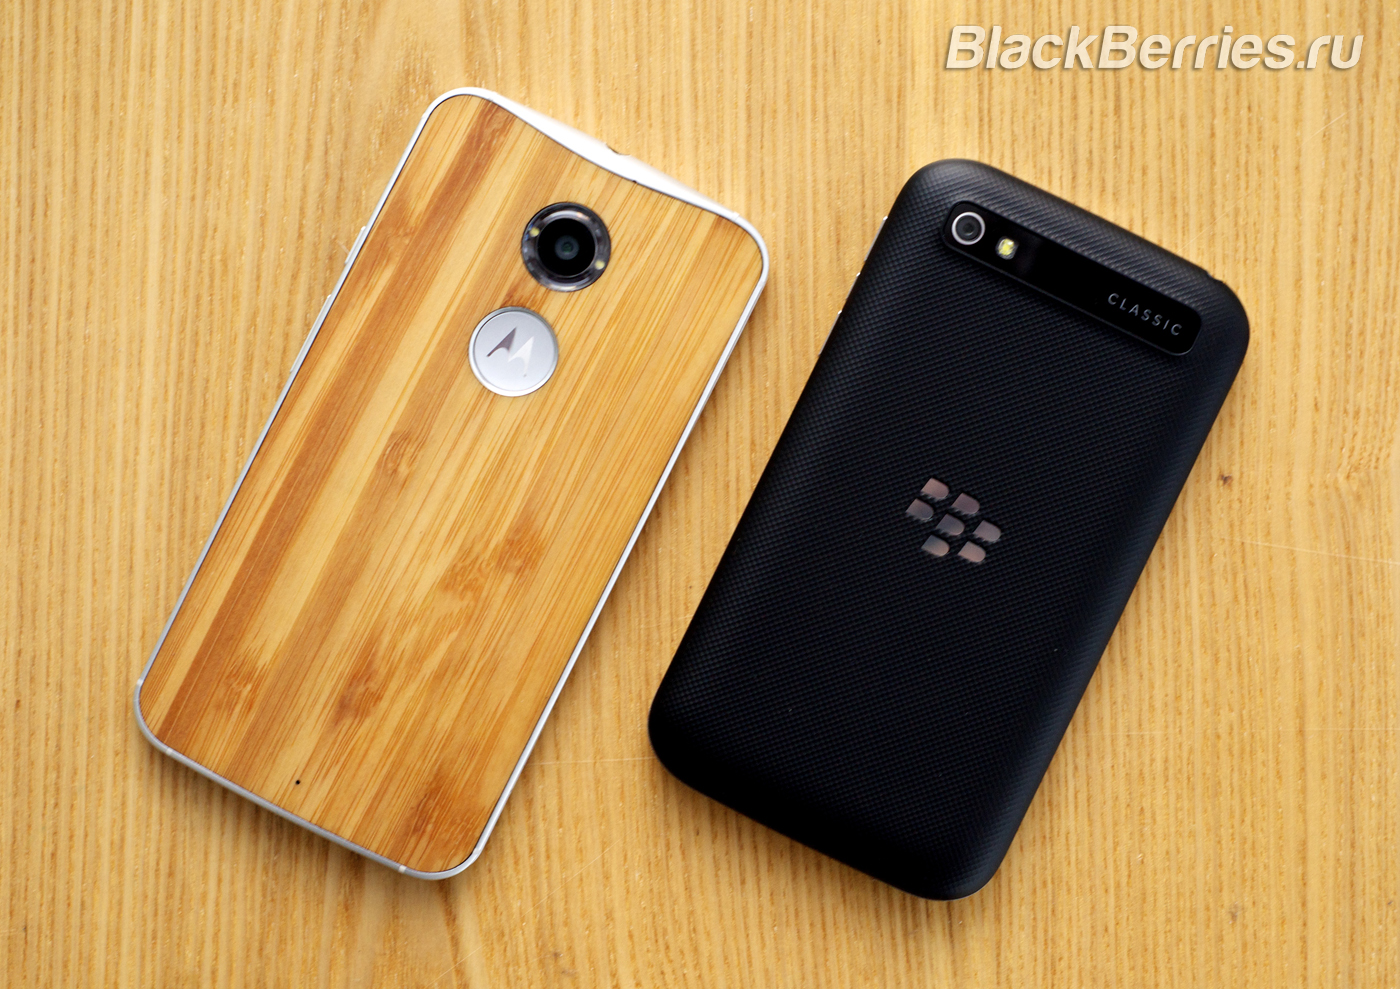 BlackBerry-Passport-Classic-Motorola-Moto-X-23